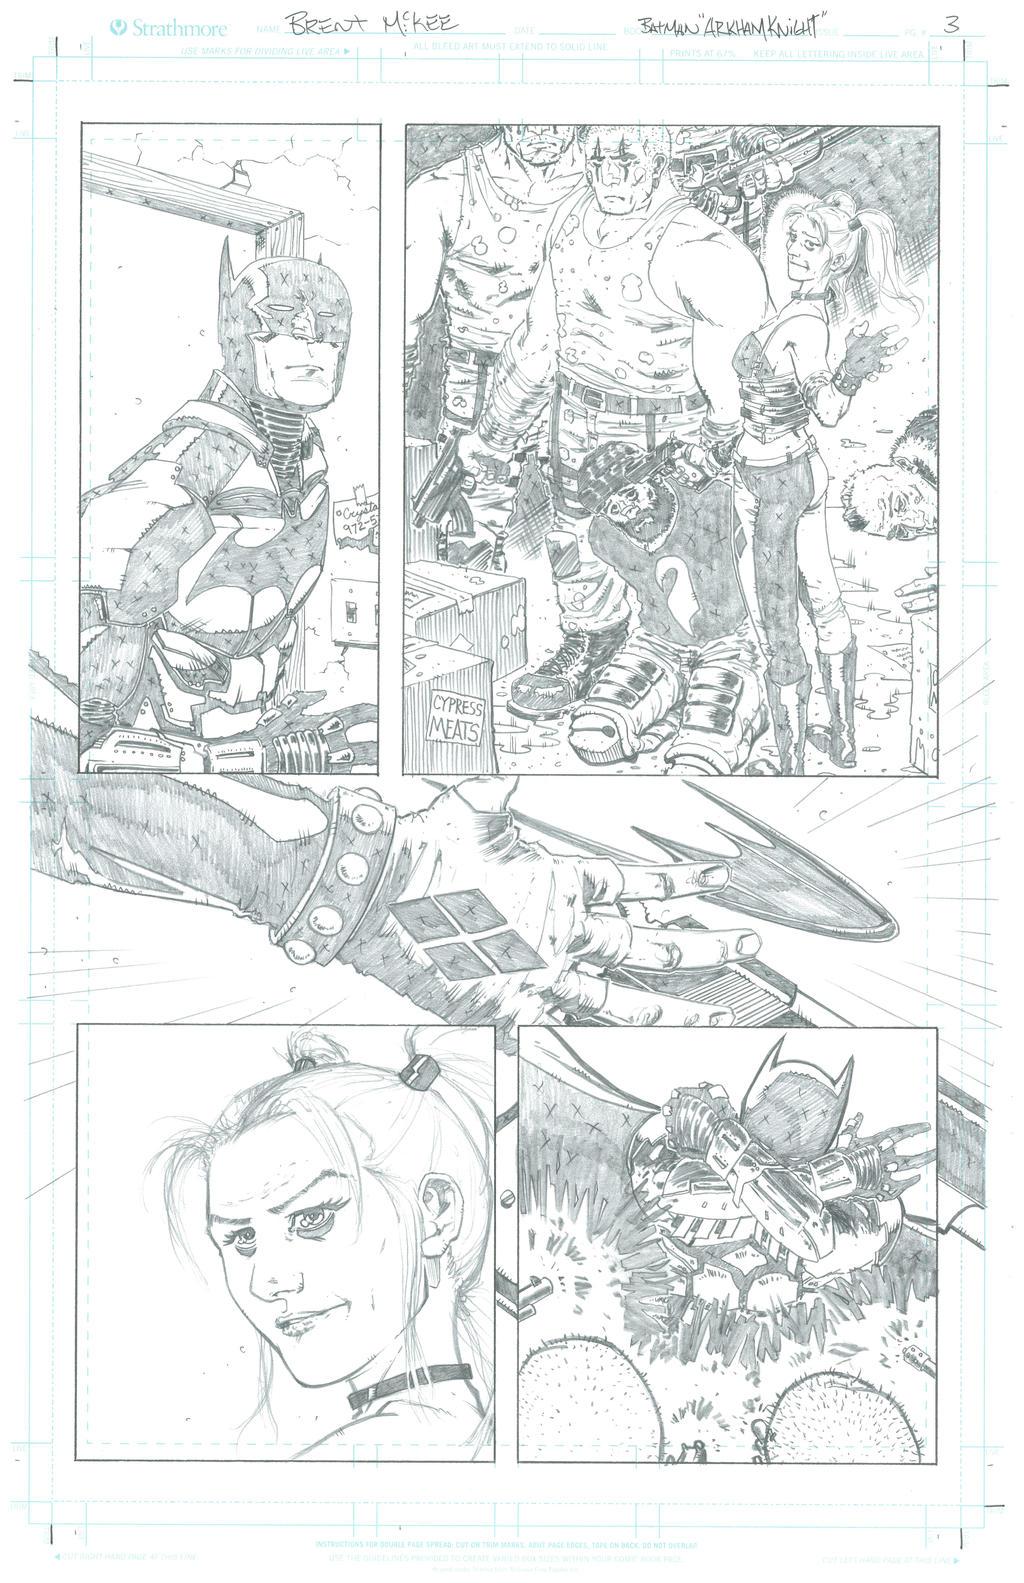 Batman Arkham Knight pg 3 sample by BrentMcKee